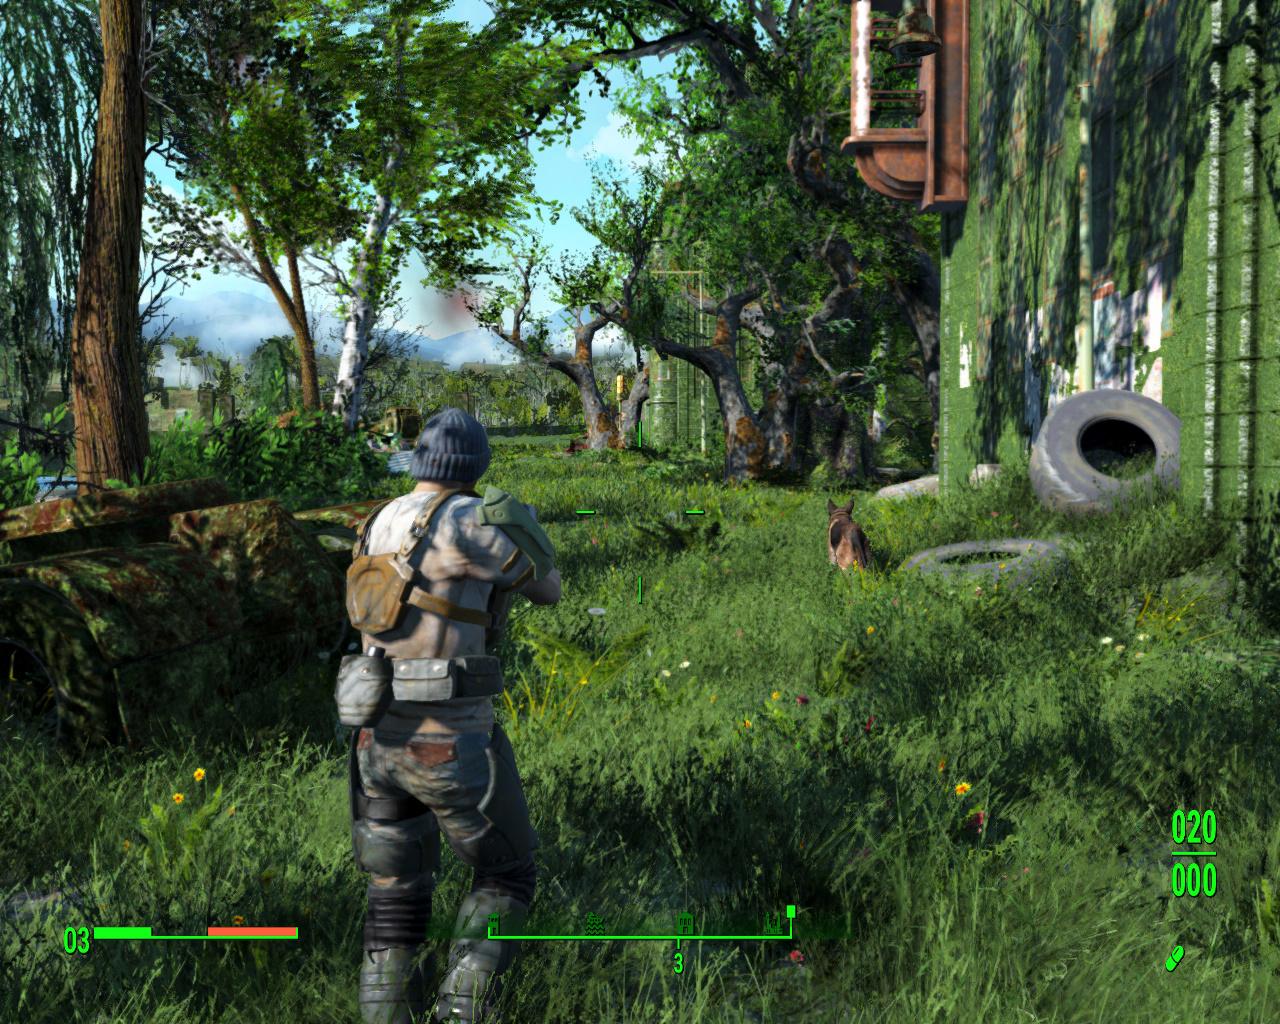 Fallout 4 Mod Brings Greener Grass To Boston VG247